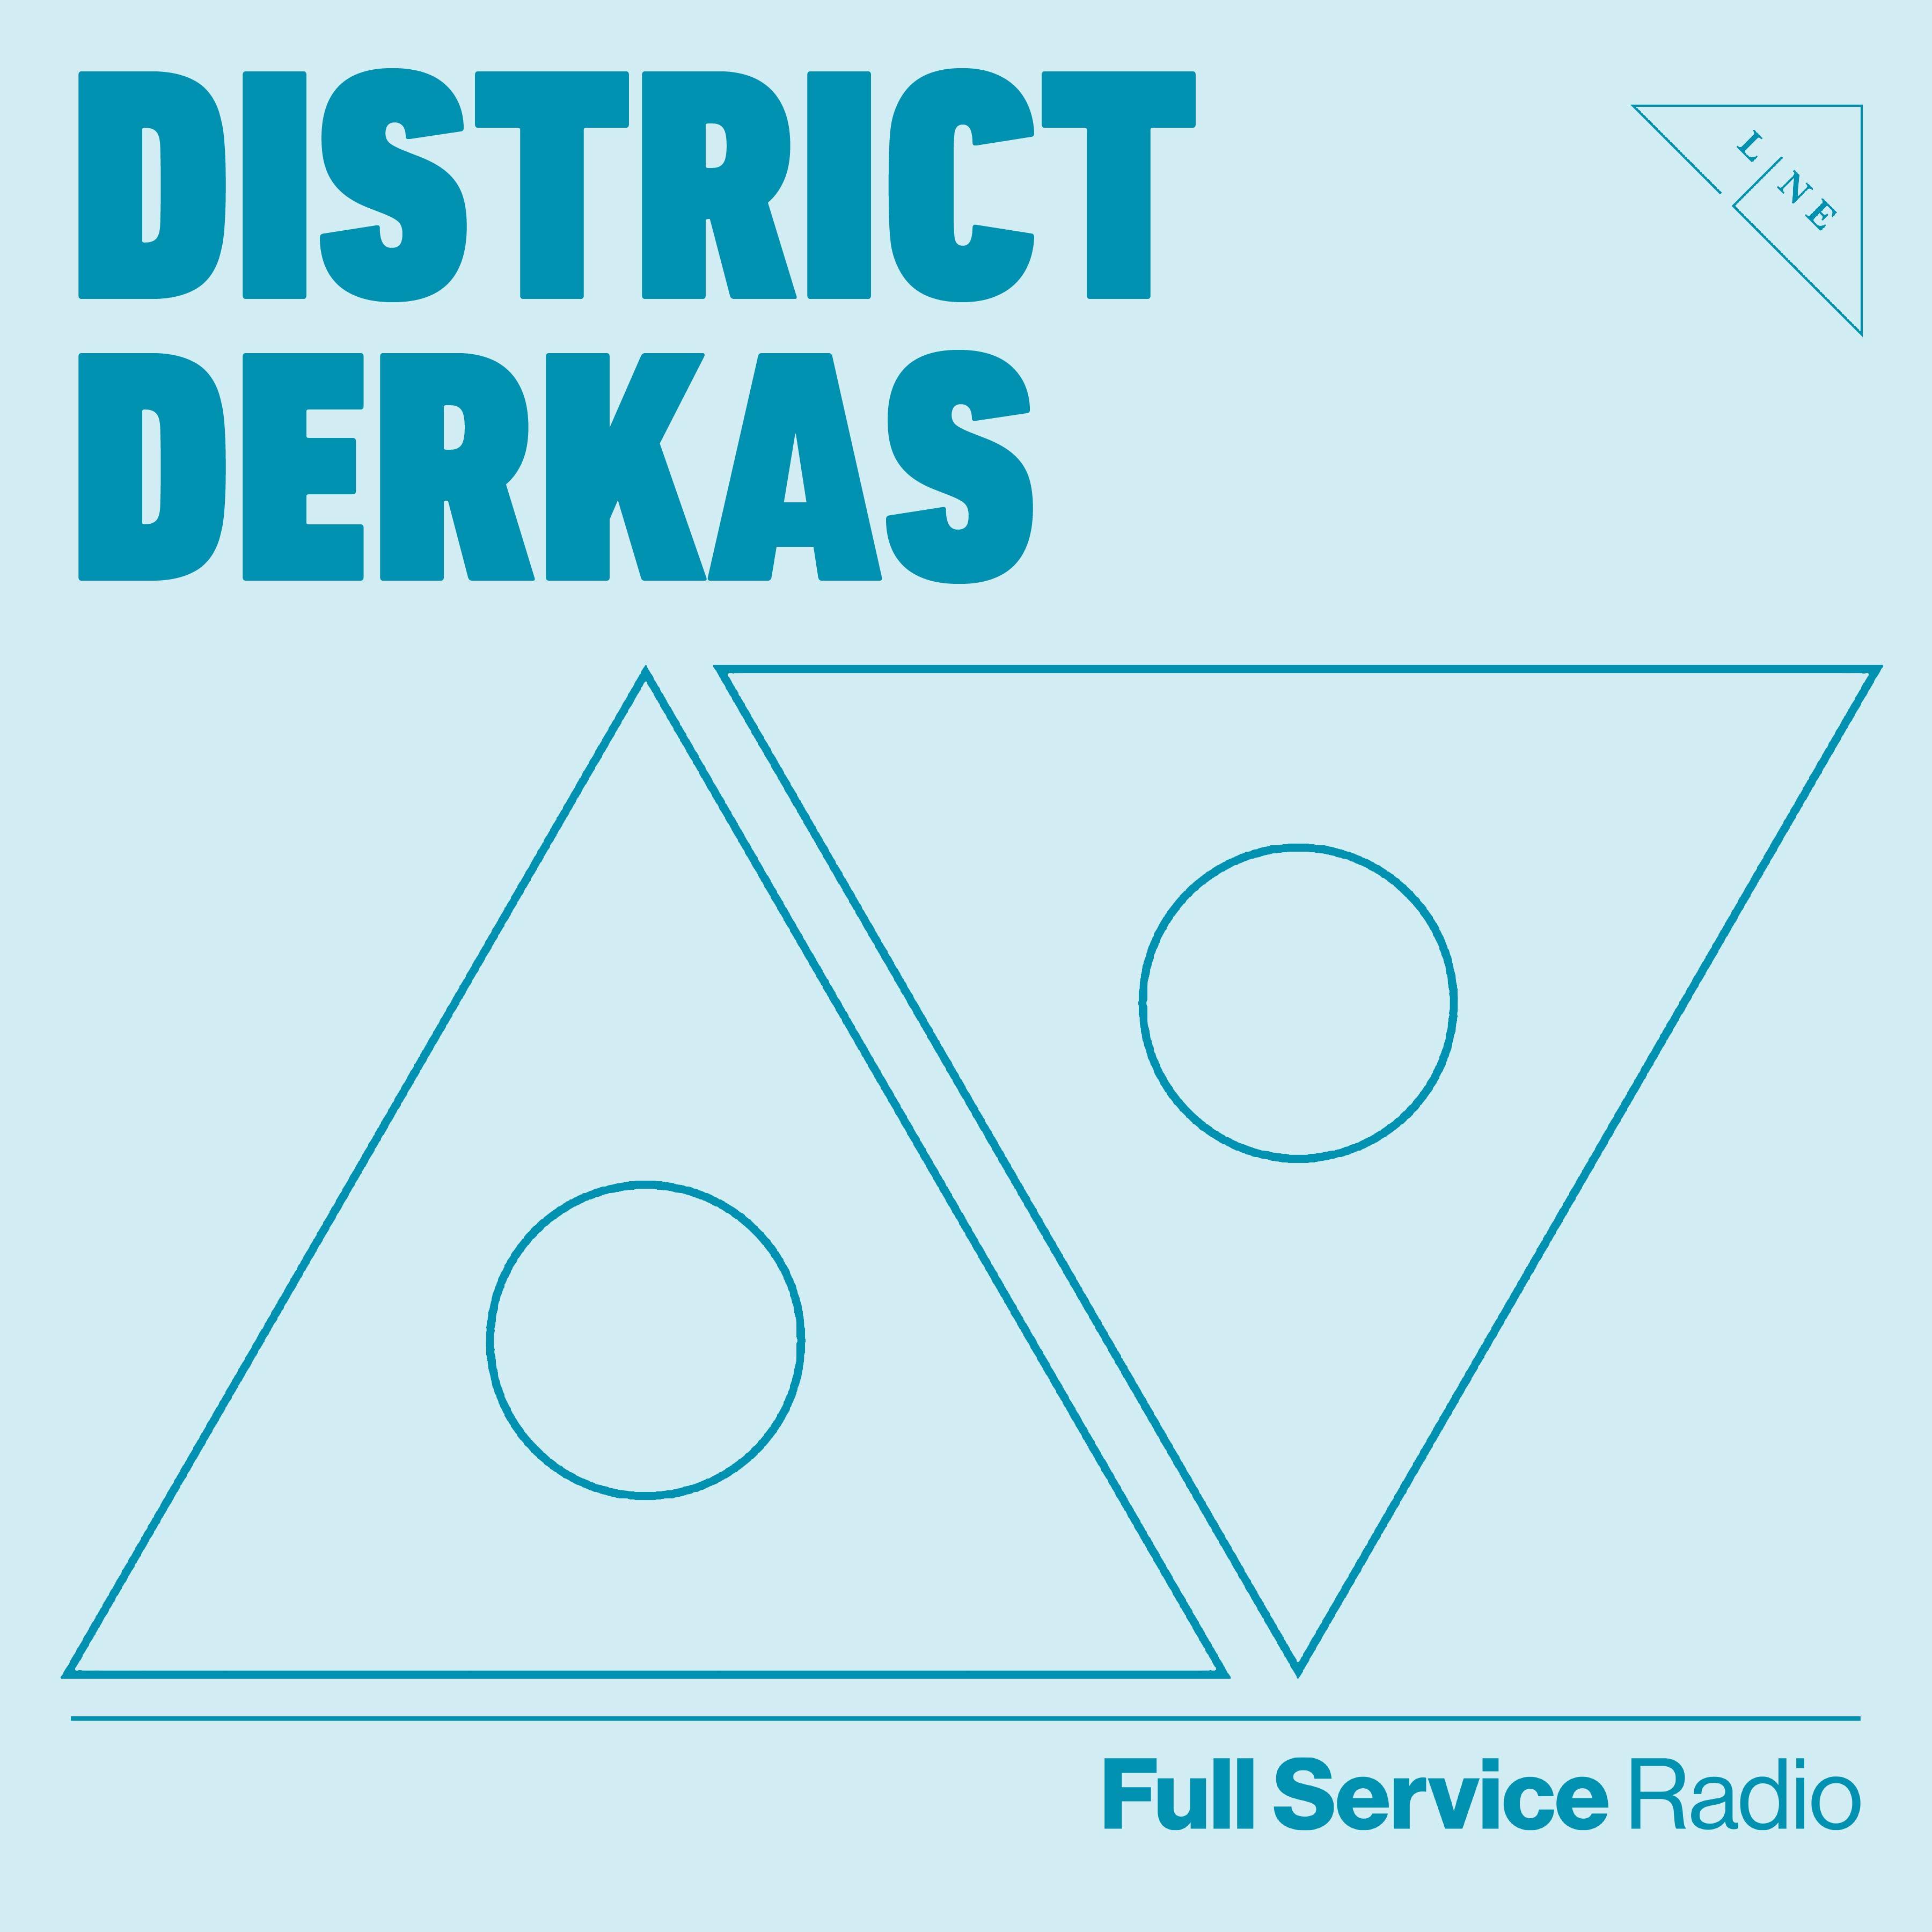 District 20derkas 01